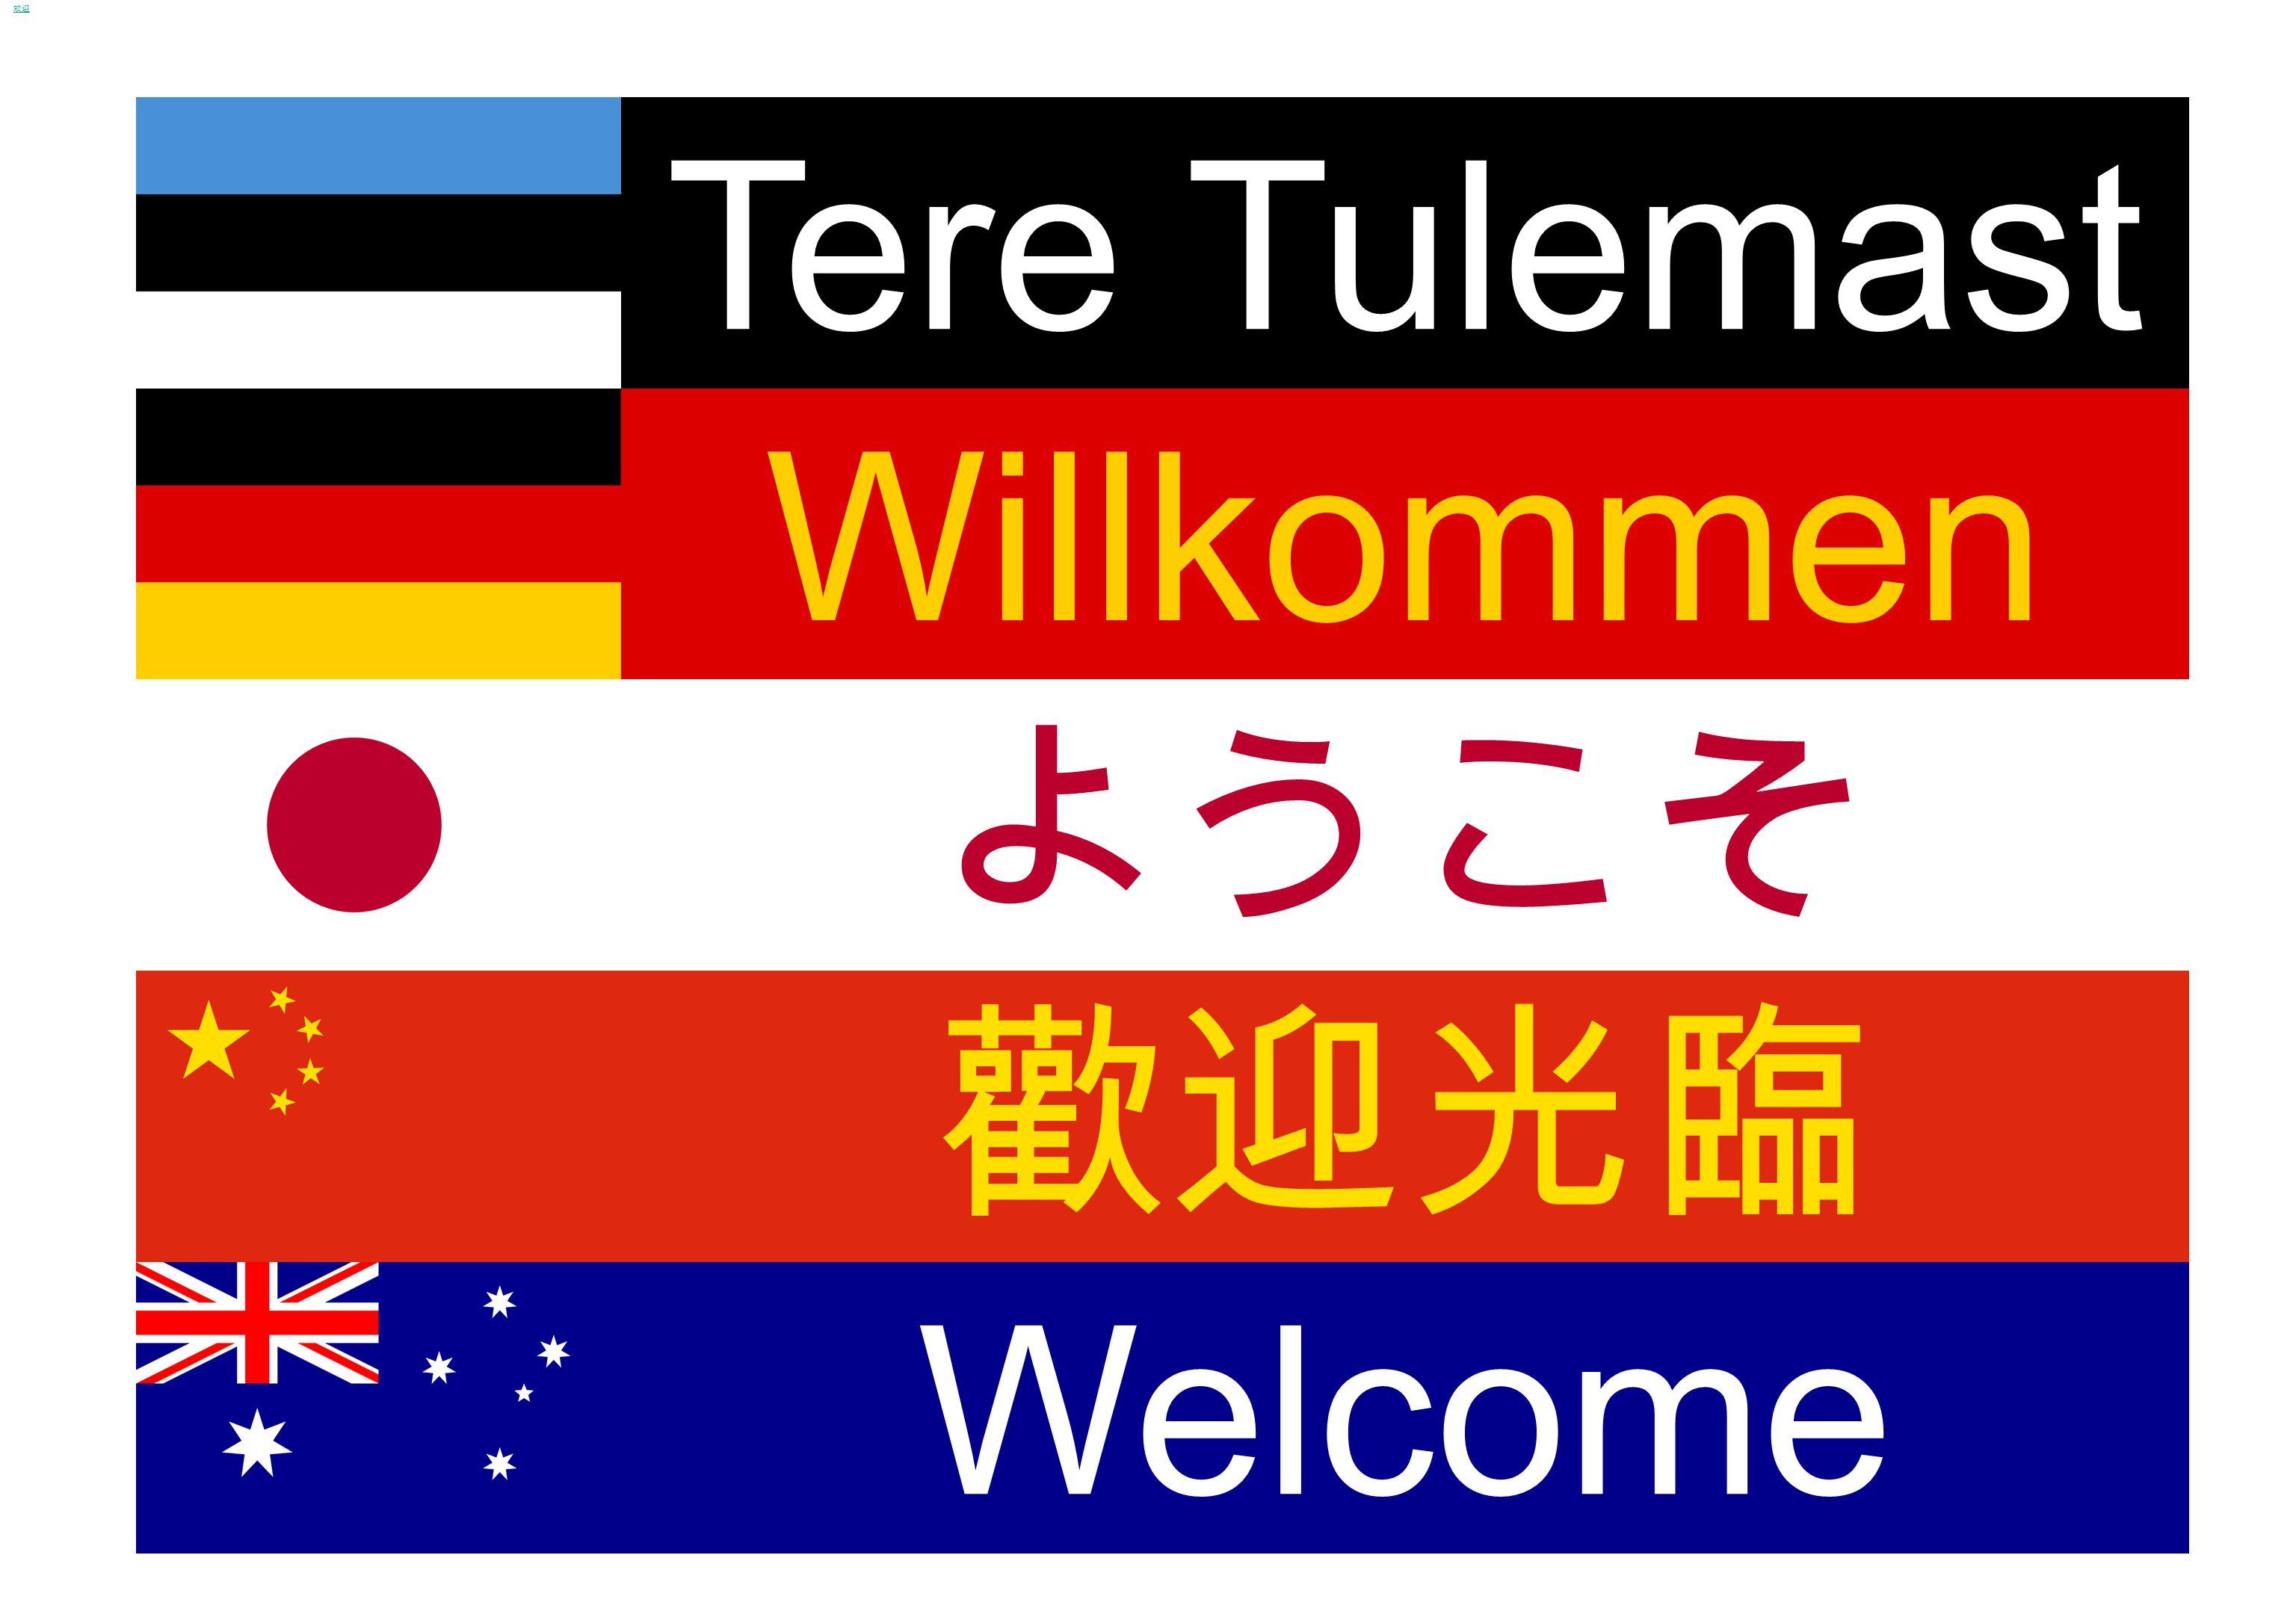 Willkommen ようこそ Tere Tulemast Welcome 歡迎光臨 欢迎